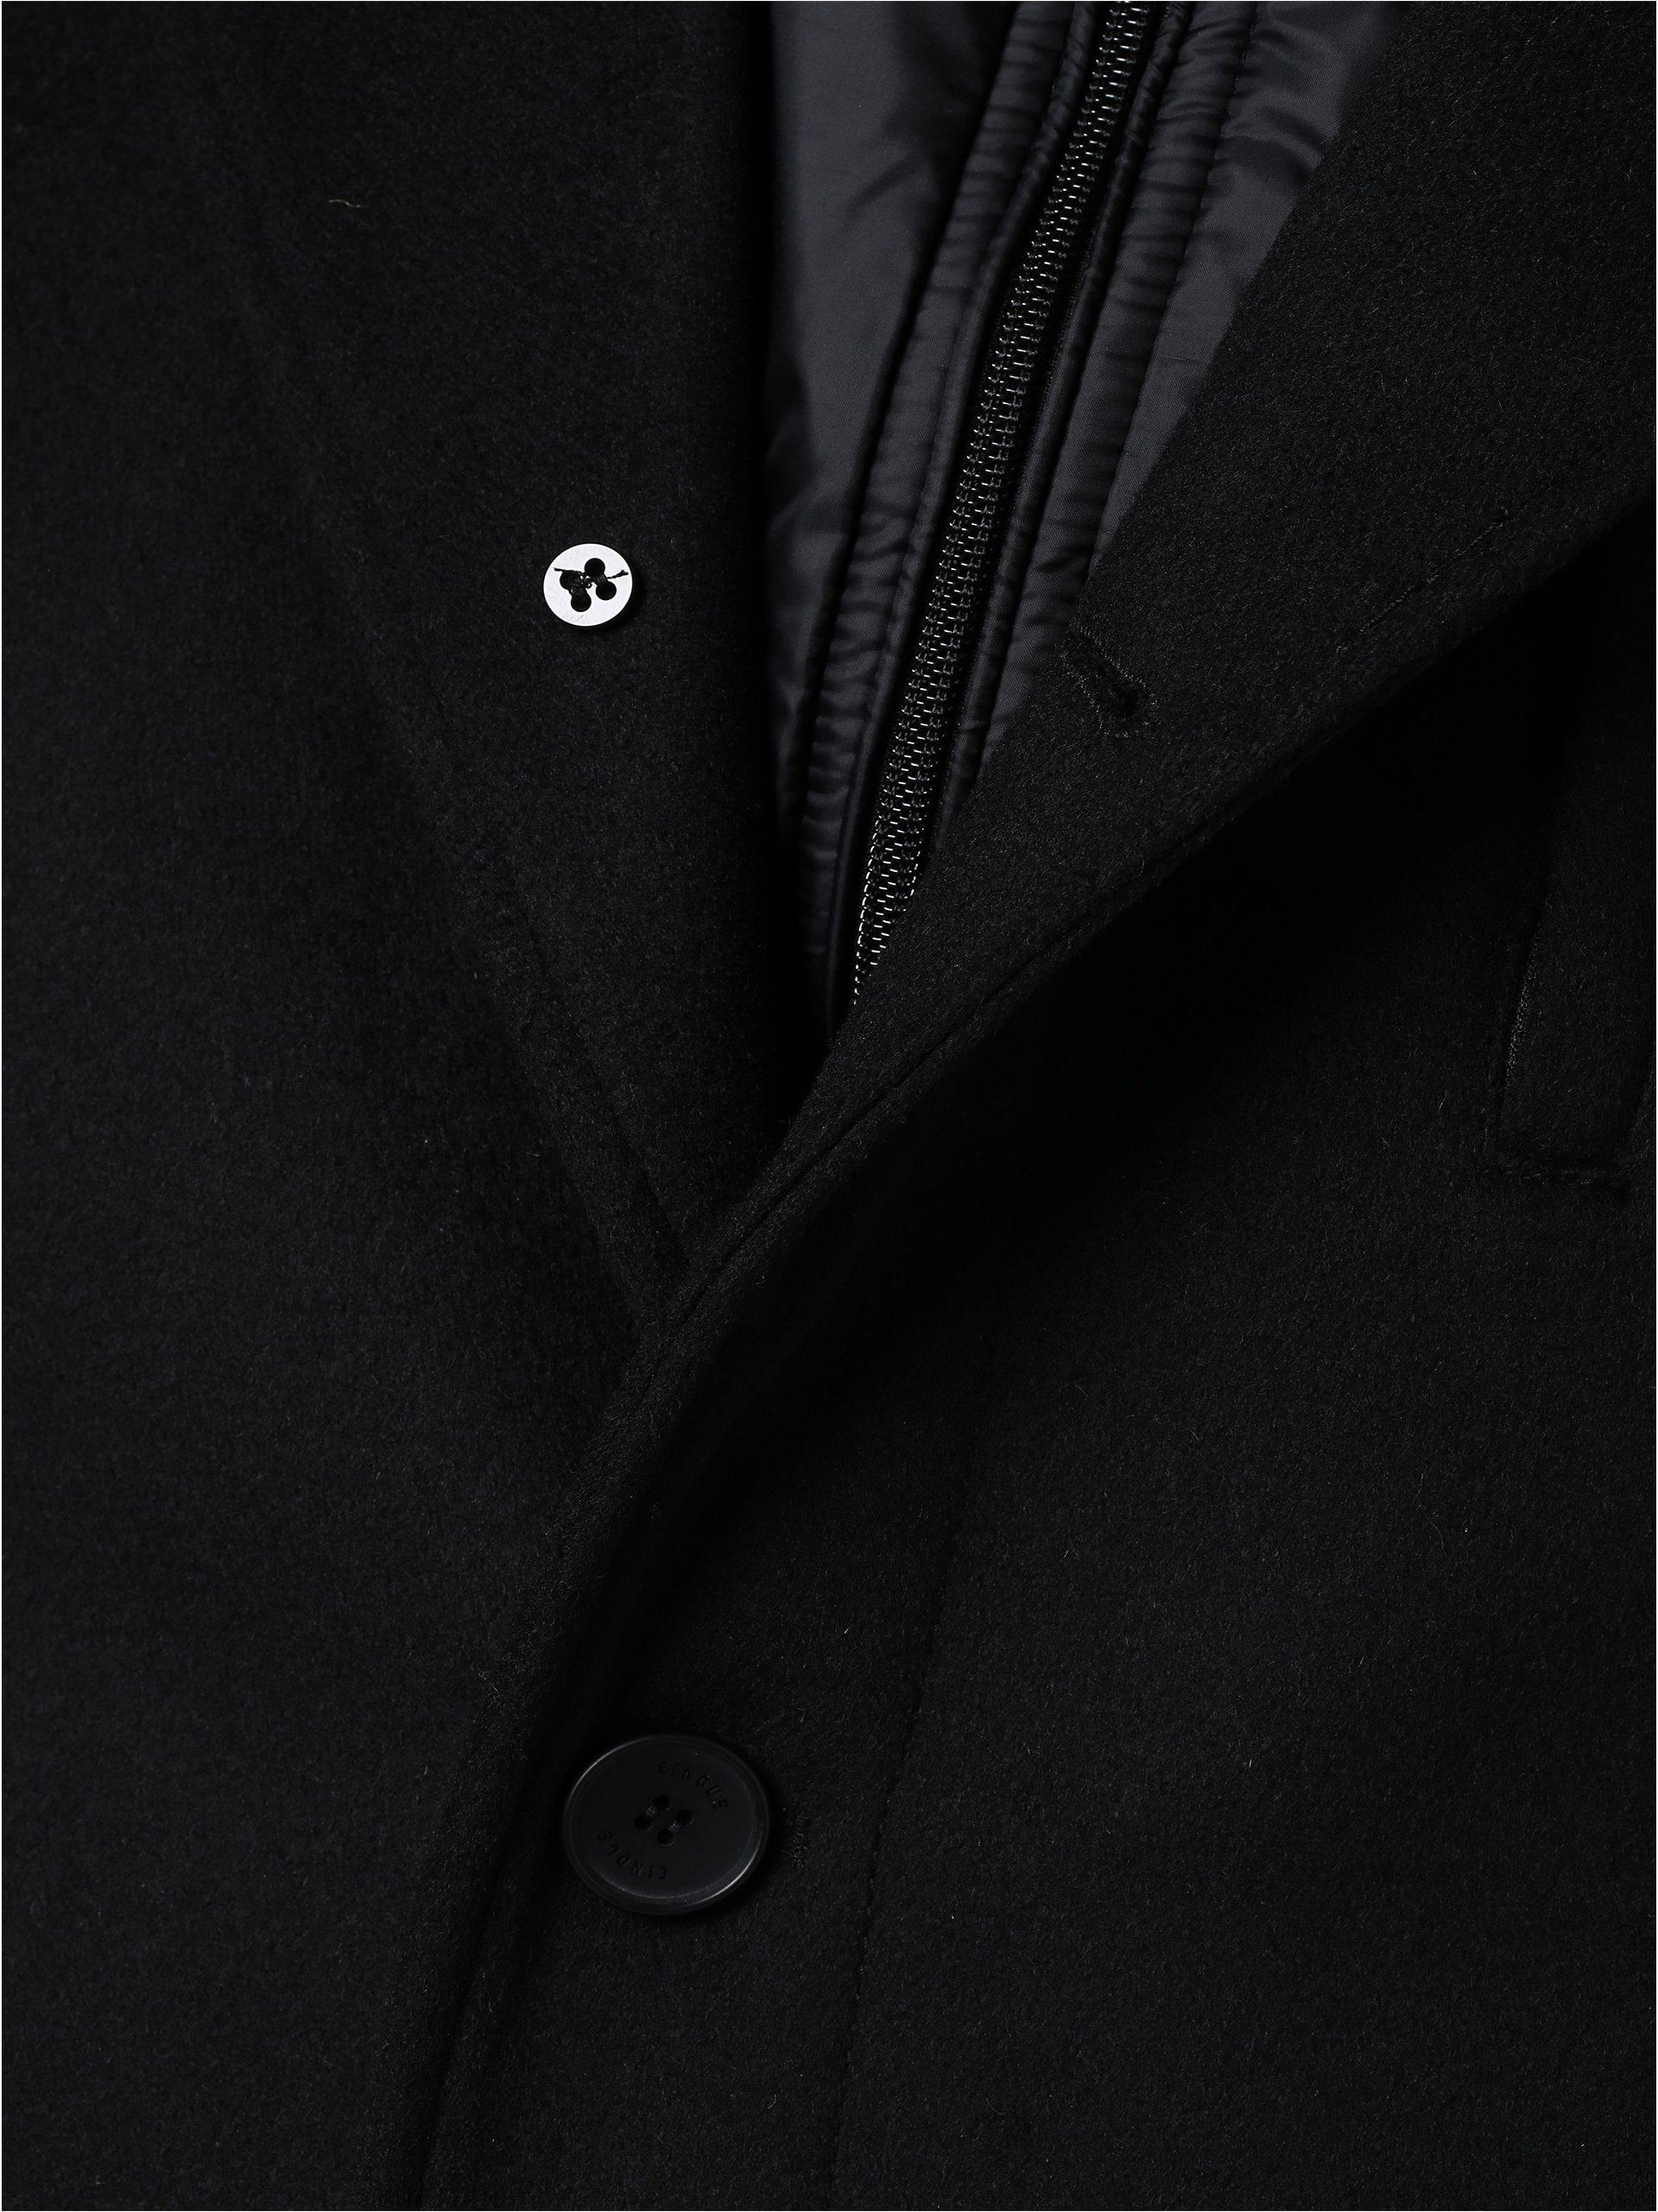 Cinque Płaszcz męski – Ciarsenal